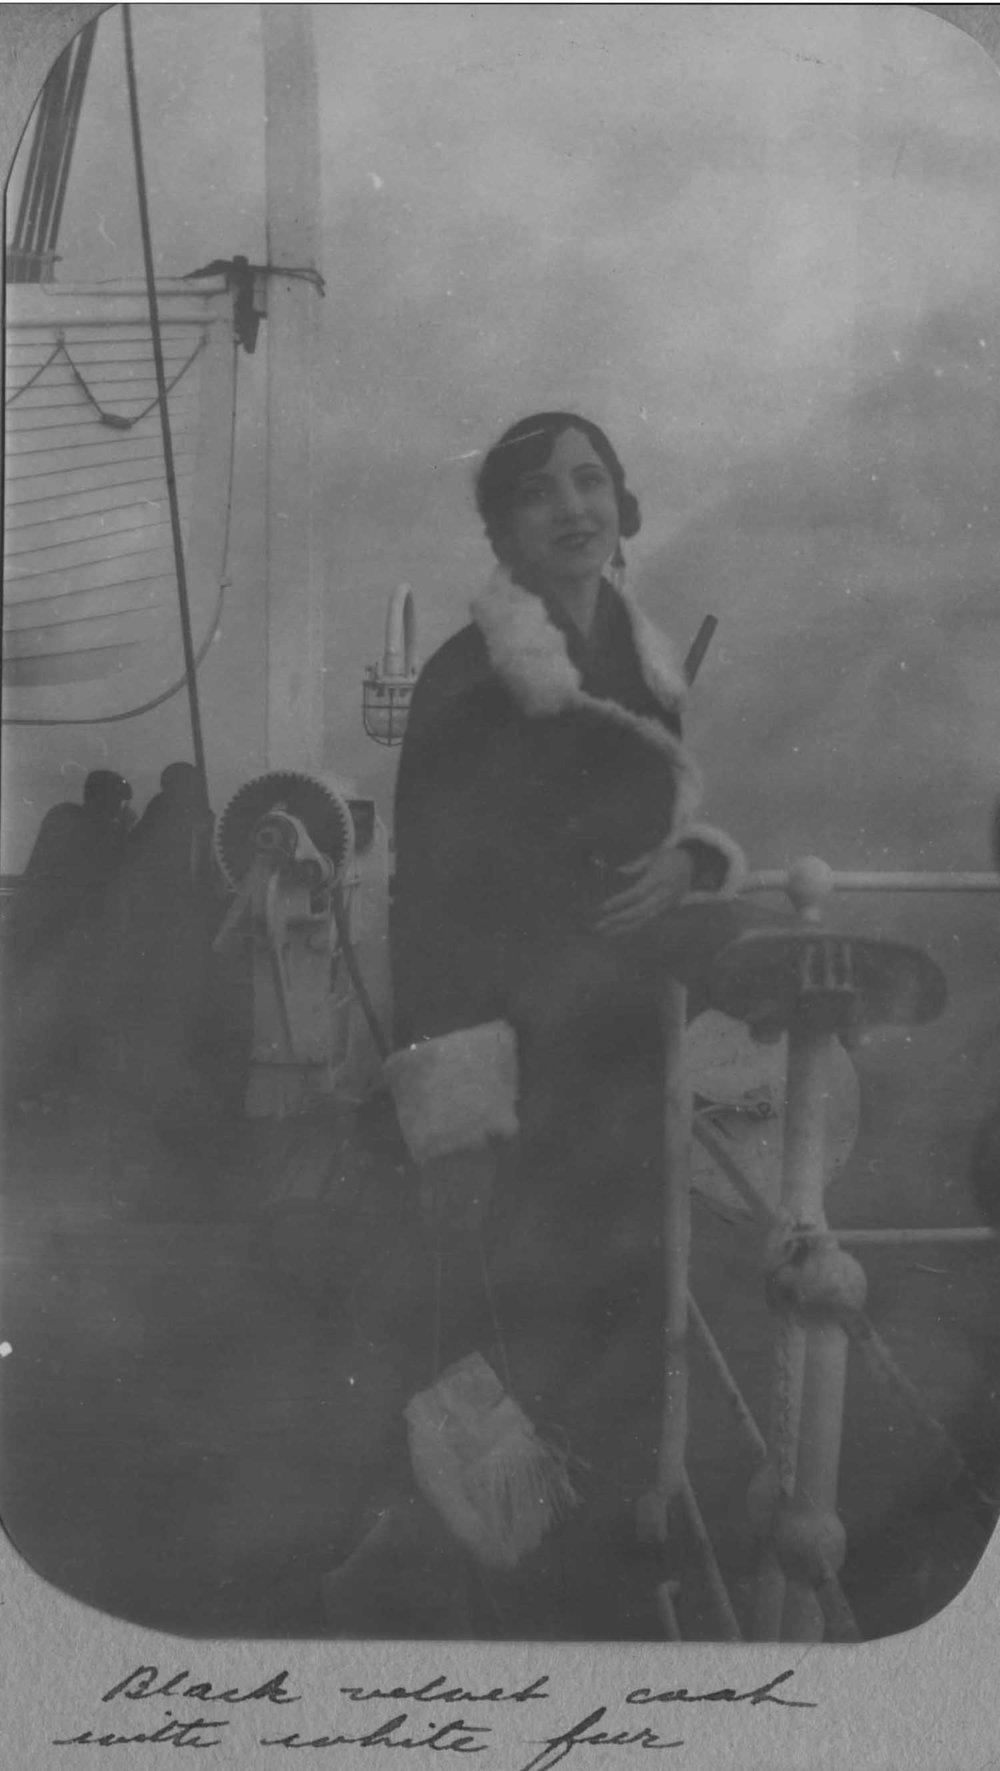 Anais 1927 16 Jul De Grasse.jpg